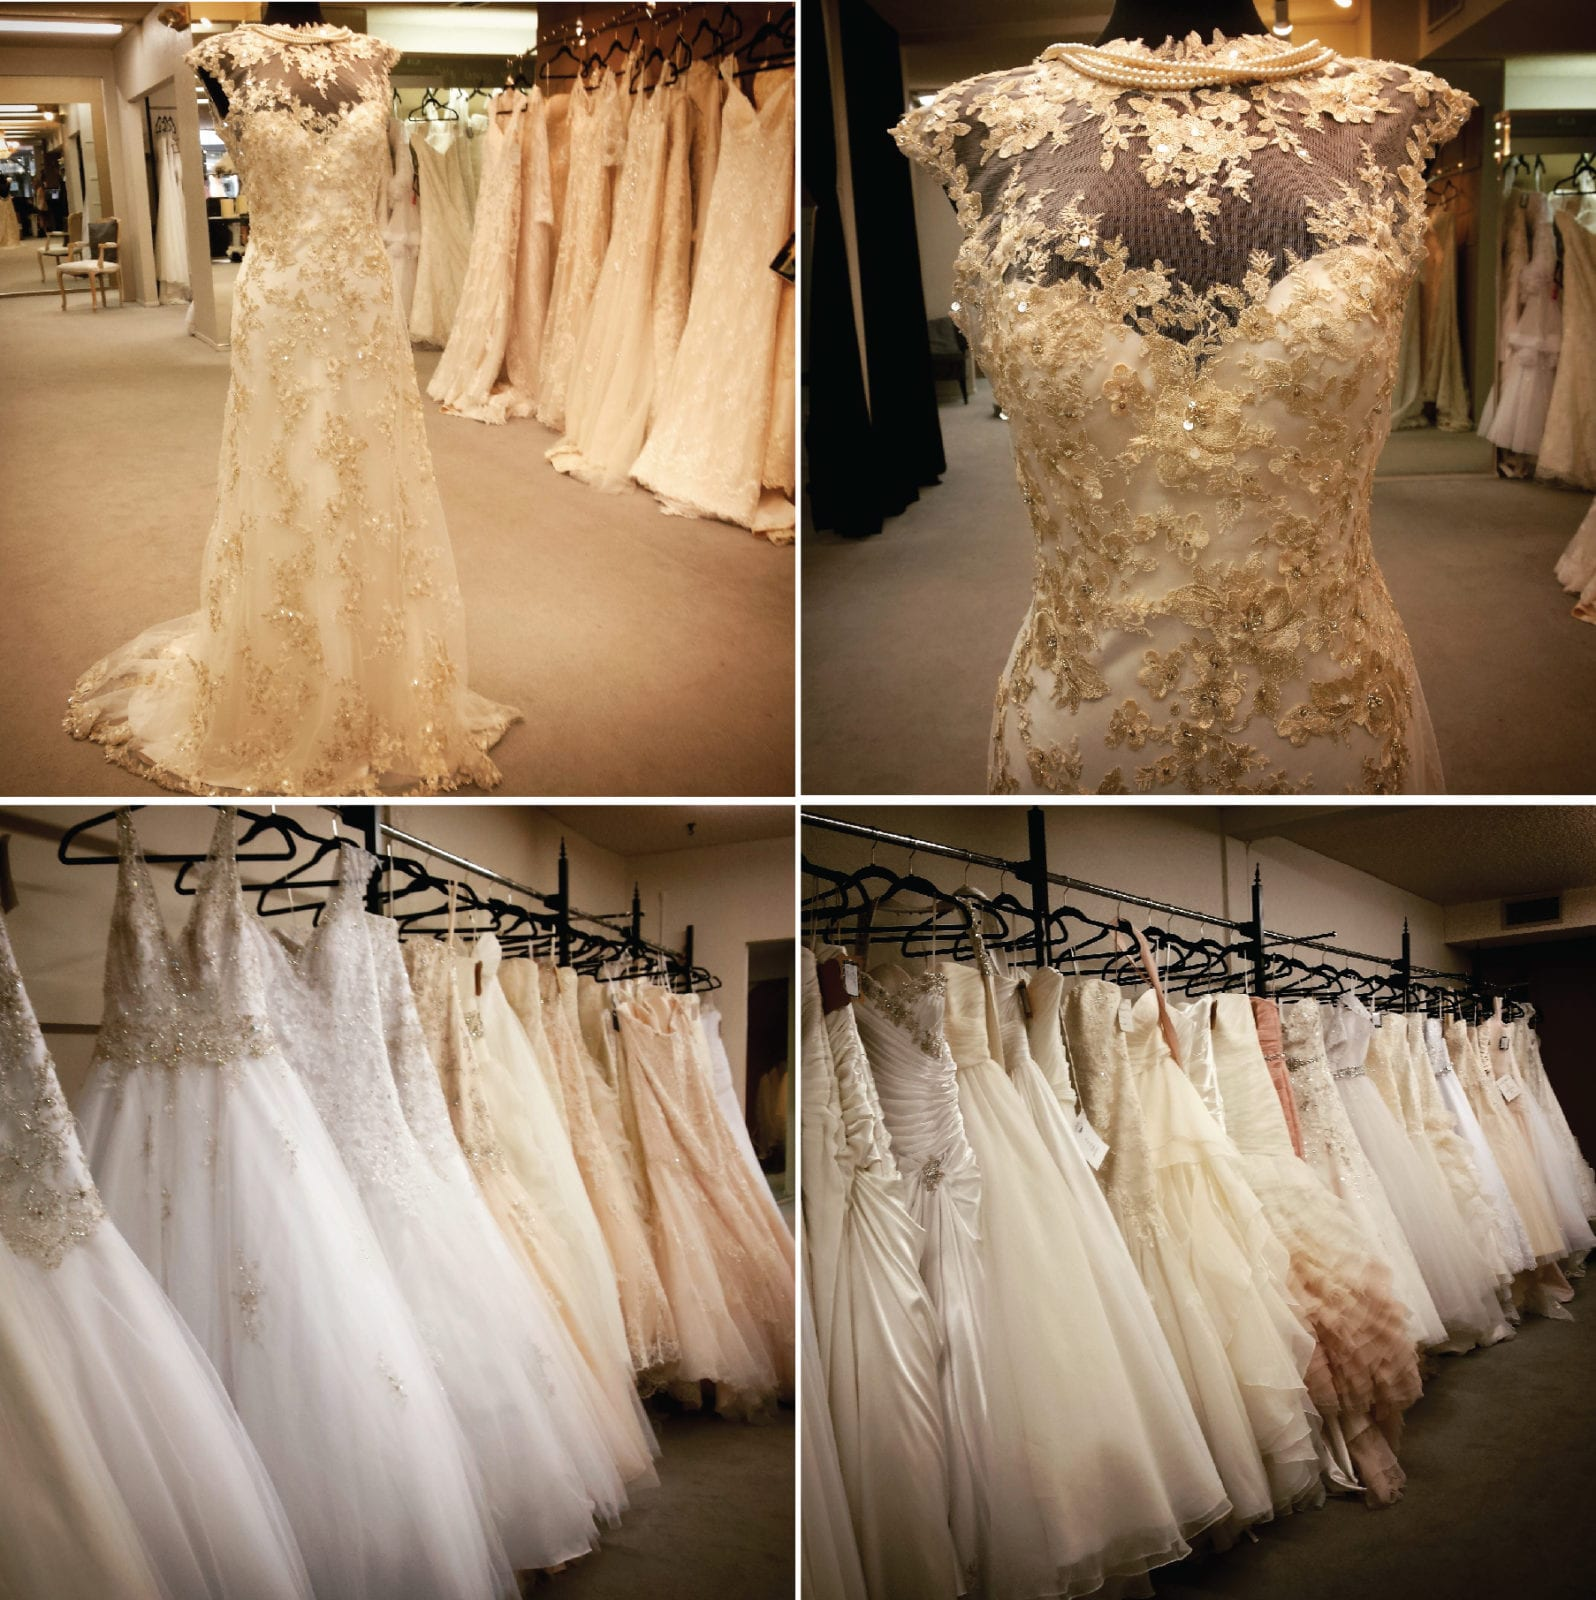 Bellingham, Bridal Gowns, Bridal Shop, Belle Bridal, Tuxedos,